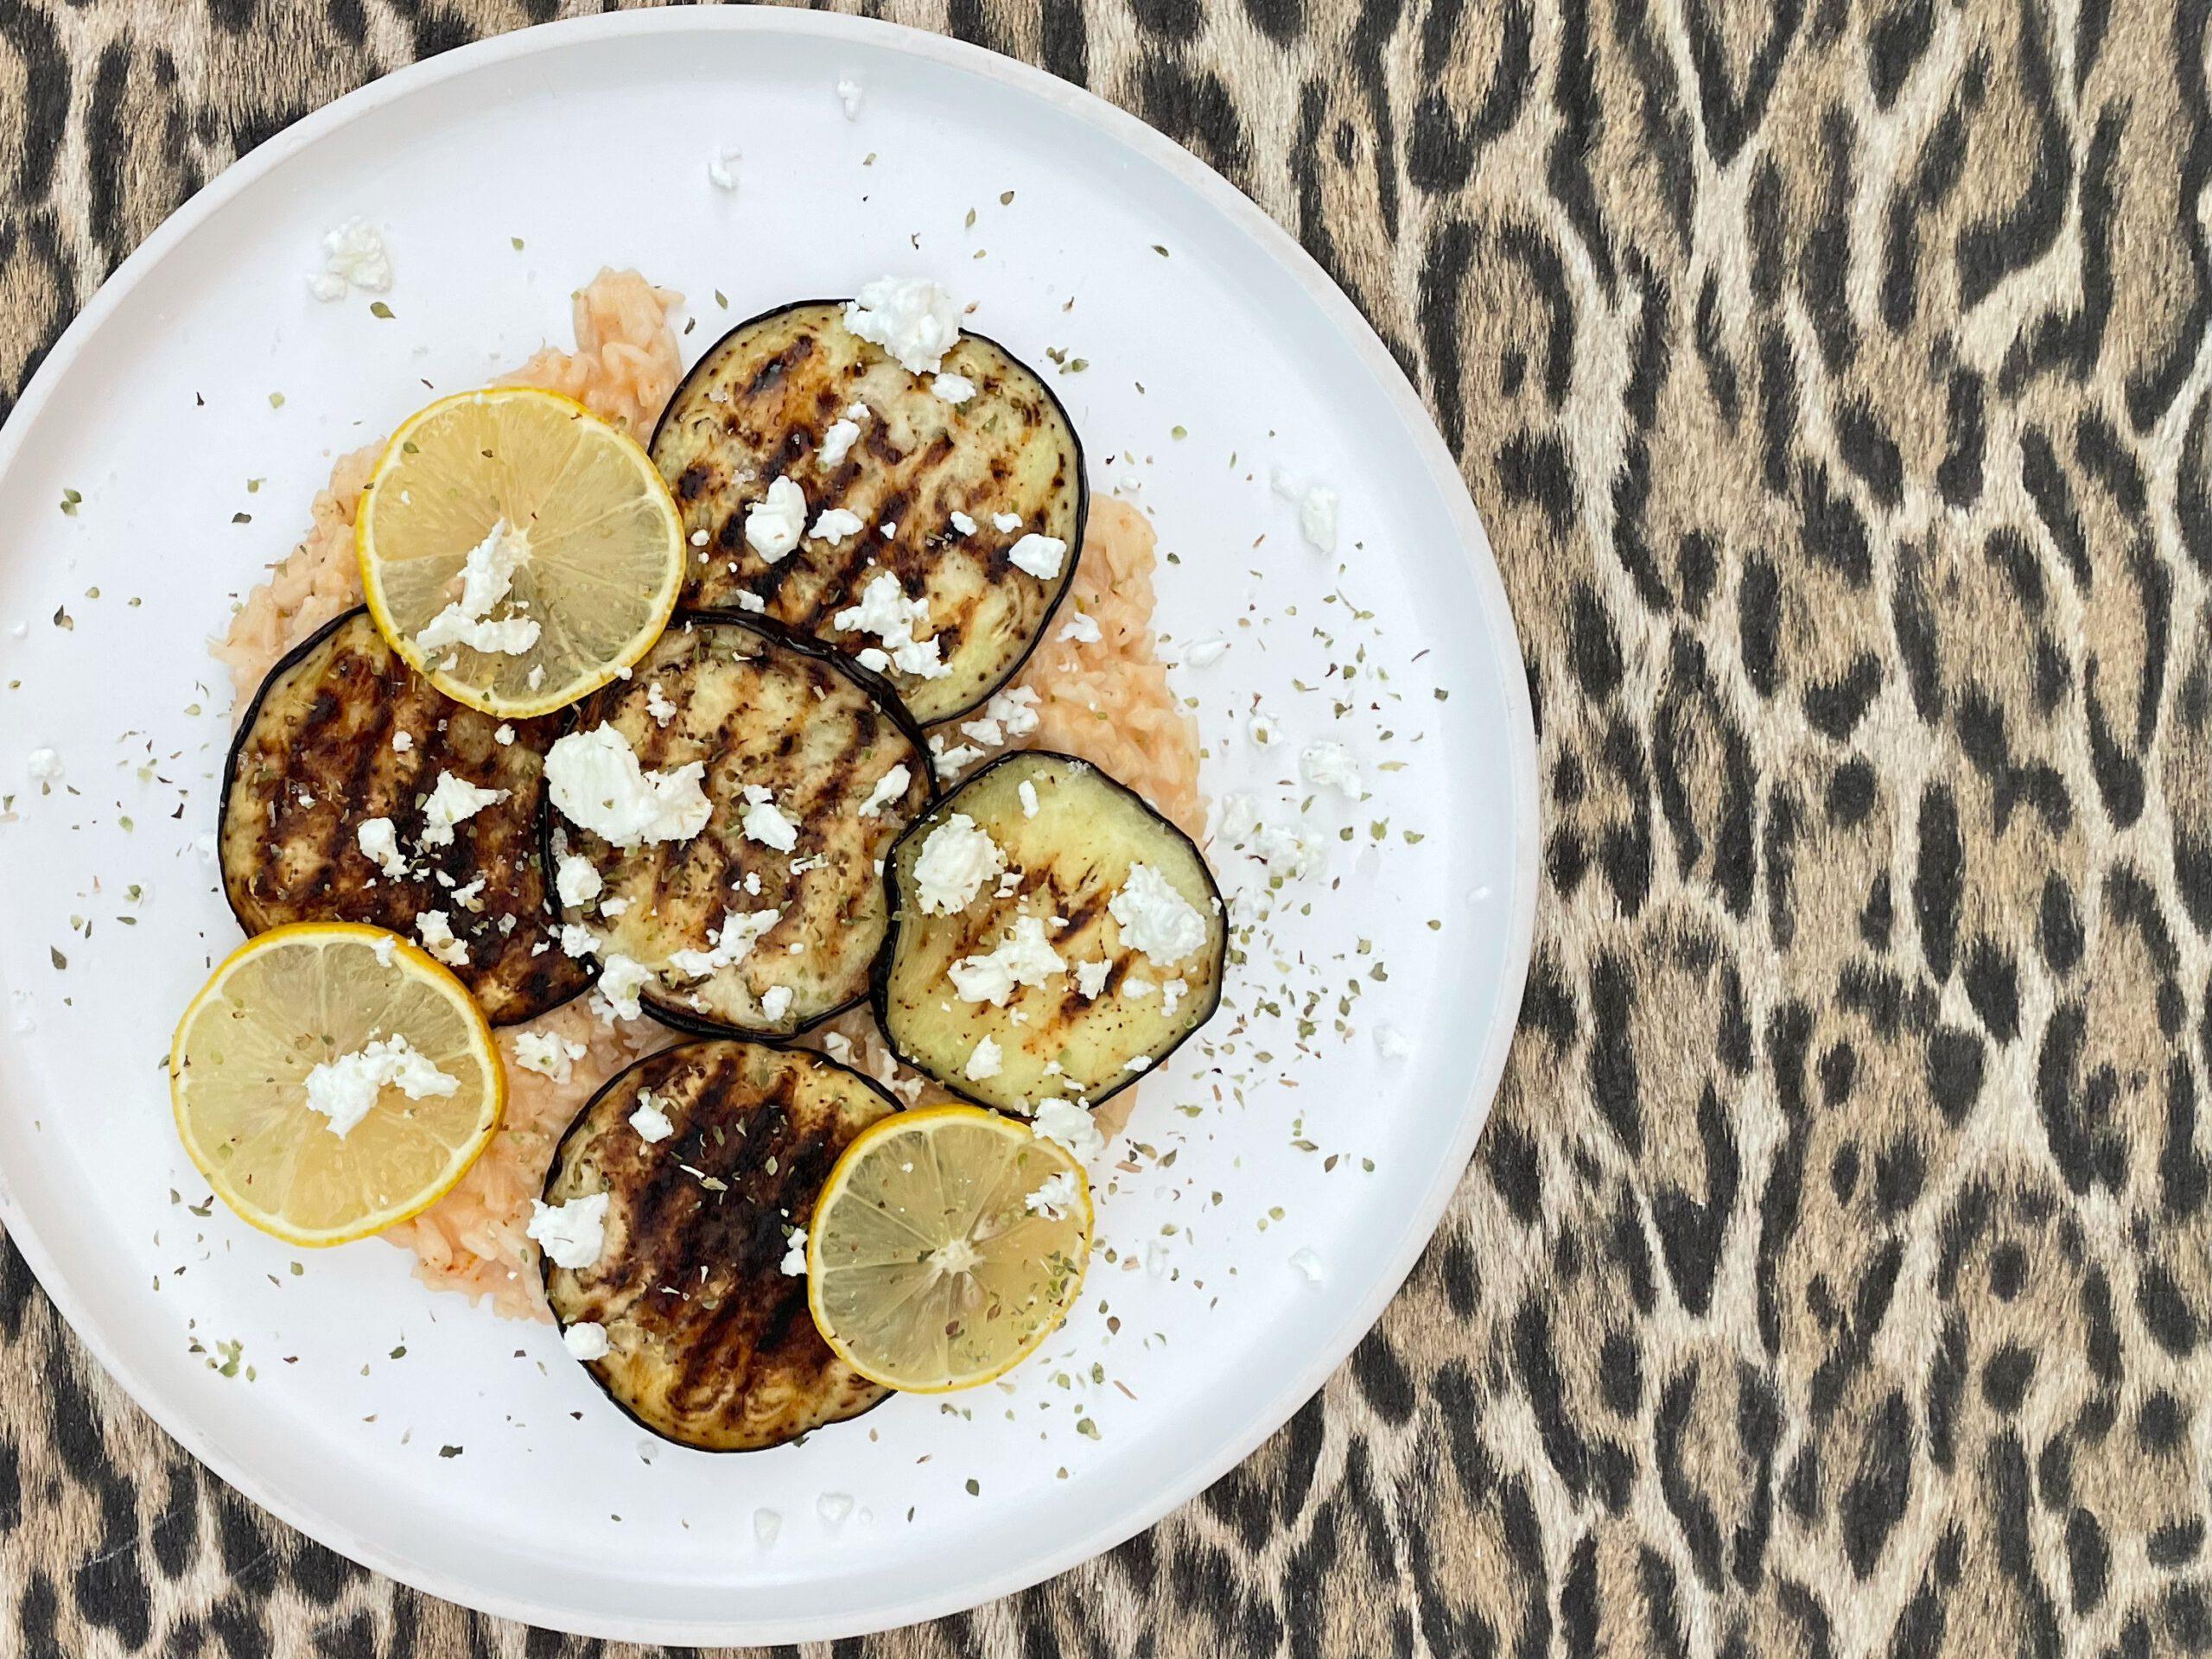 Griekse gegrilde aubergineschotel